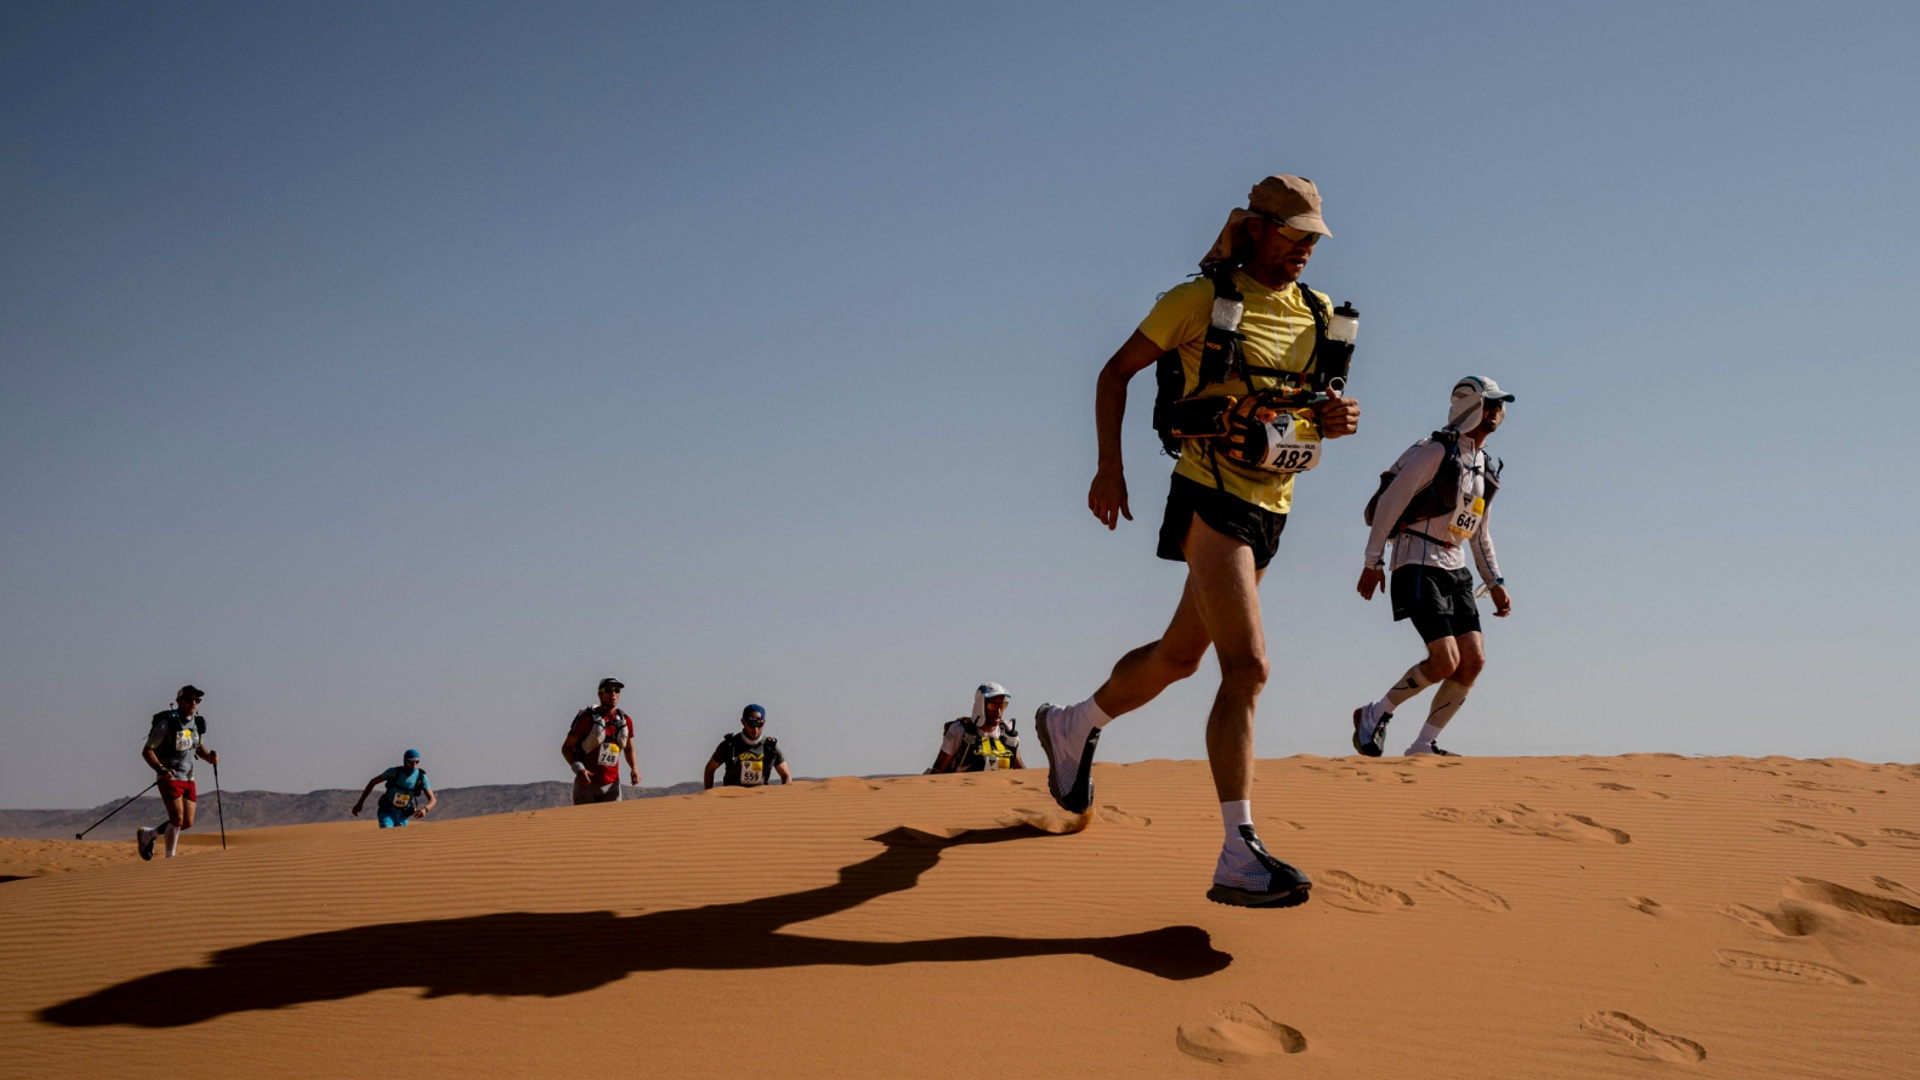 Во время знаменитого Сахарского марафона умер бегун